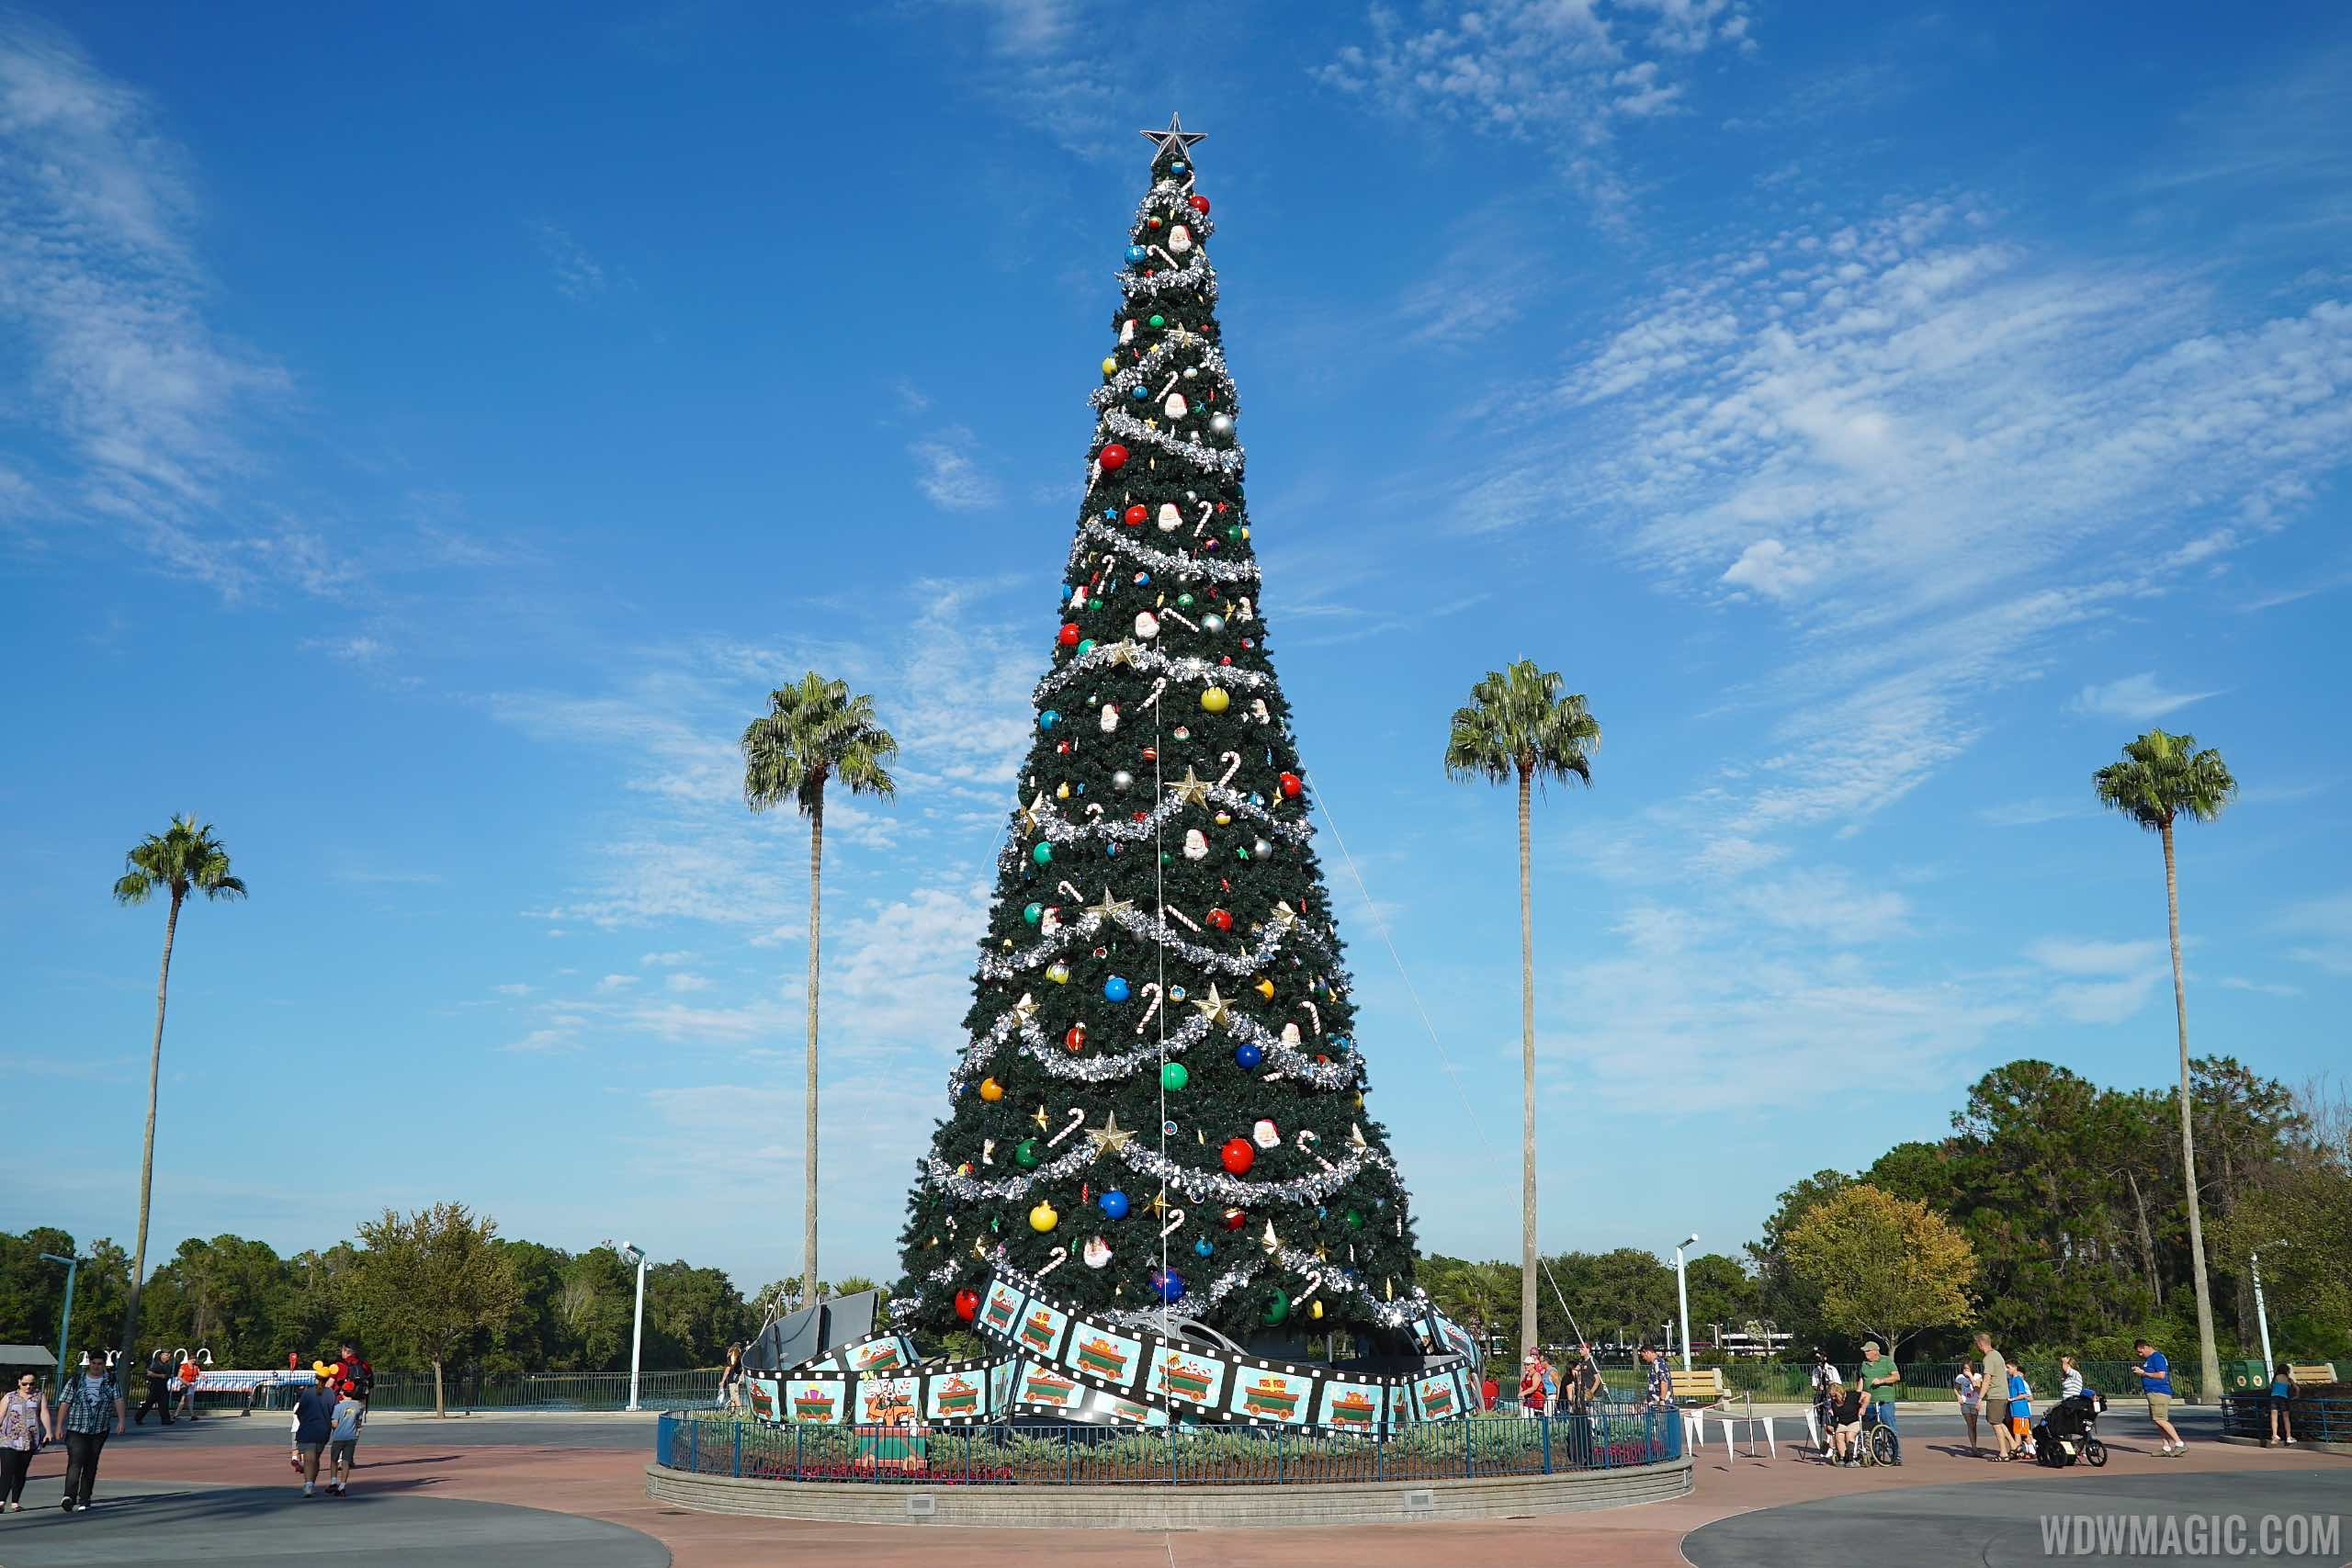 Disney world christmas decorations 2014 - Disney World Christmas Decorations 2014 31